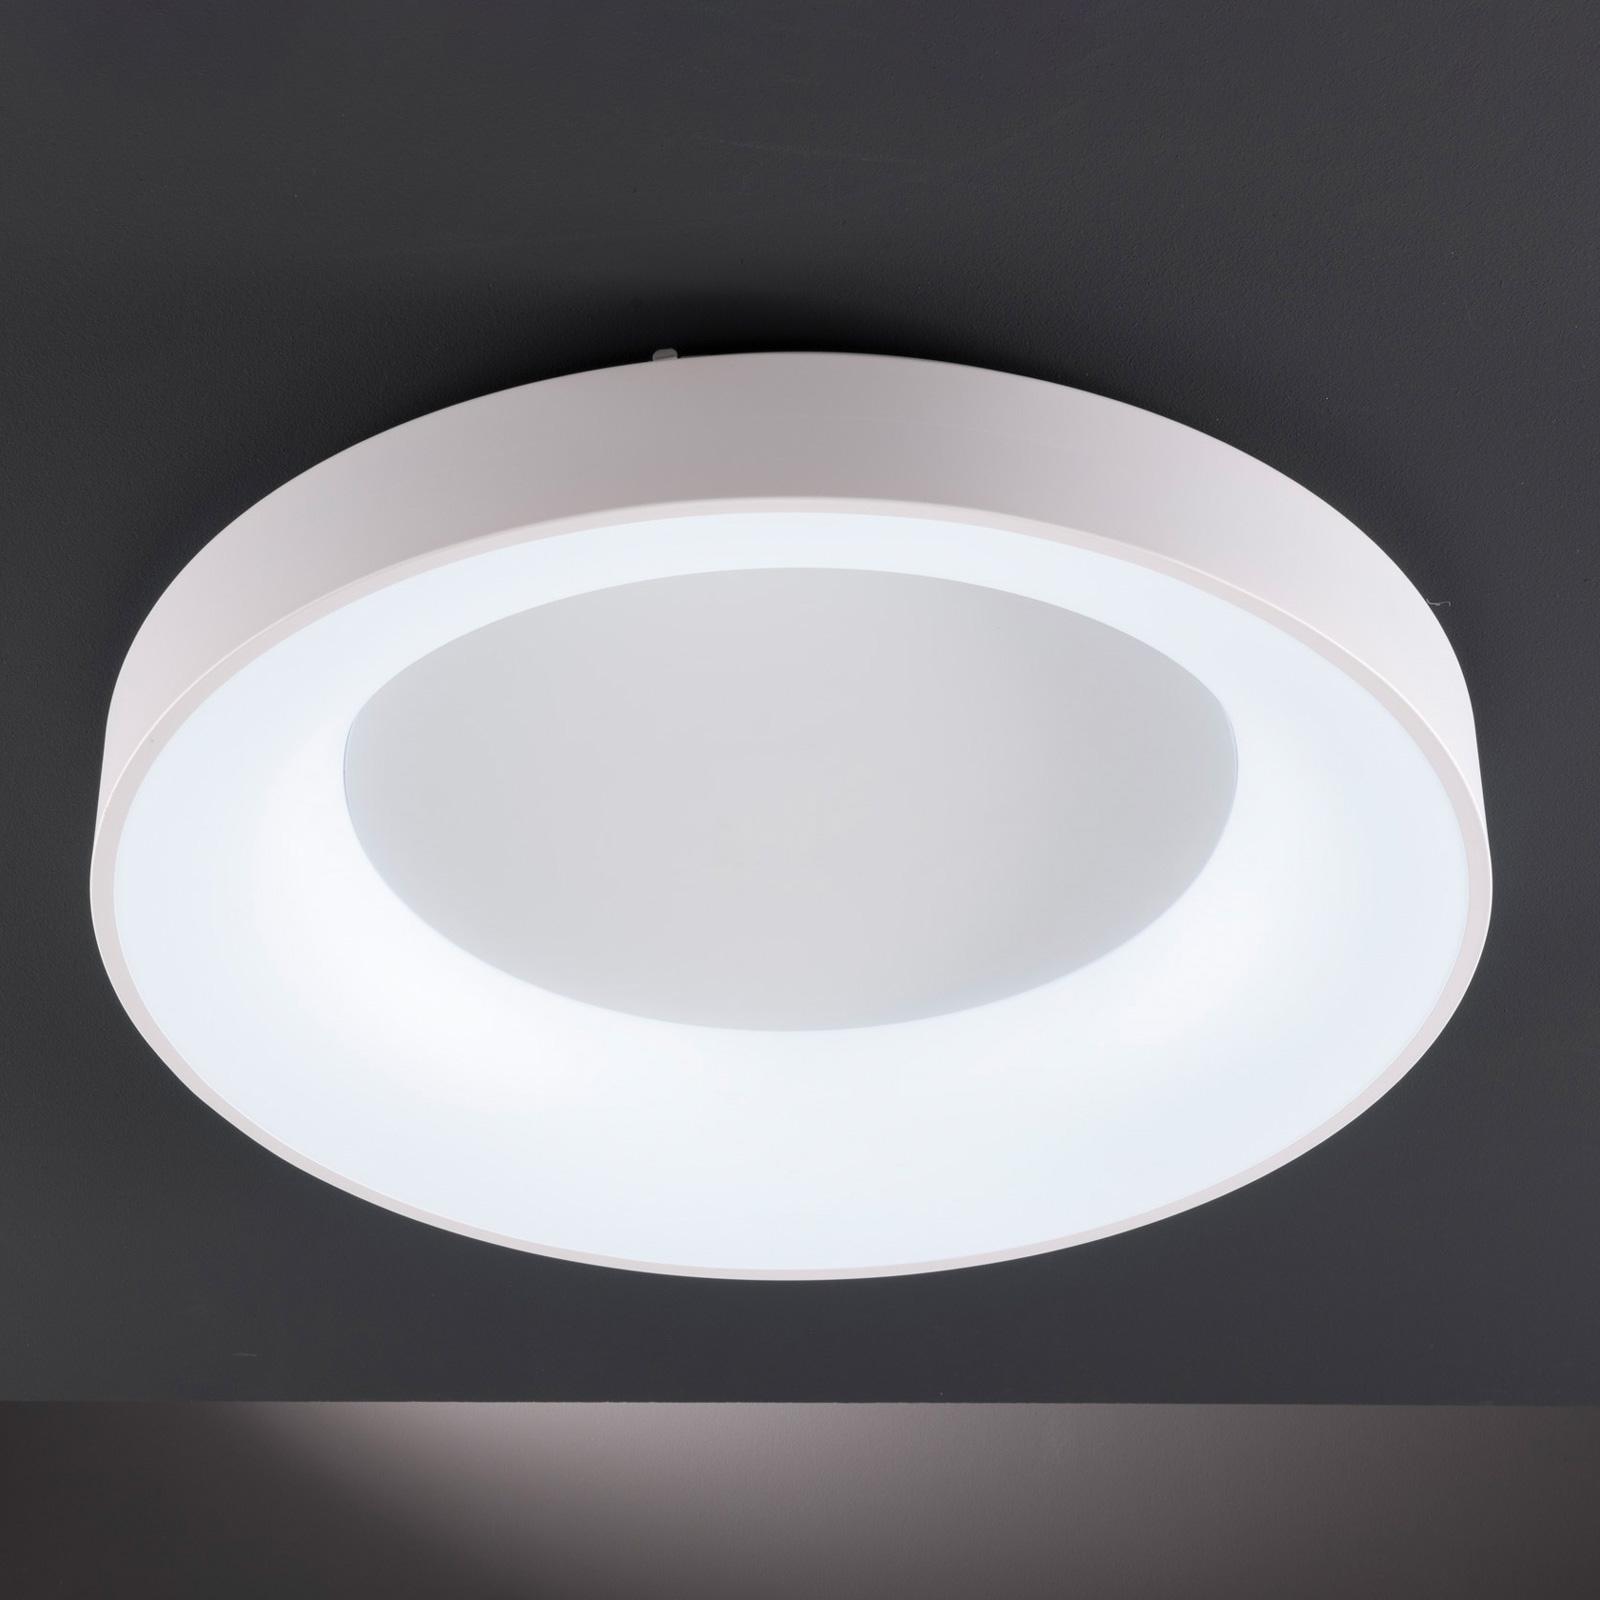 Lampa sufitowa LED Cameron z pilotem, Ø45cm